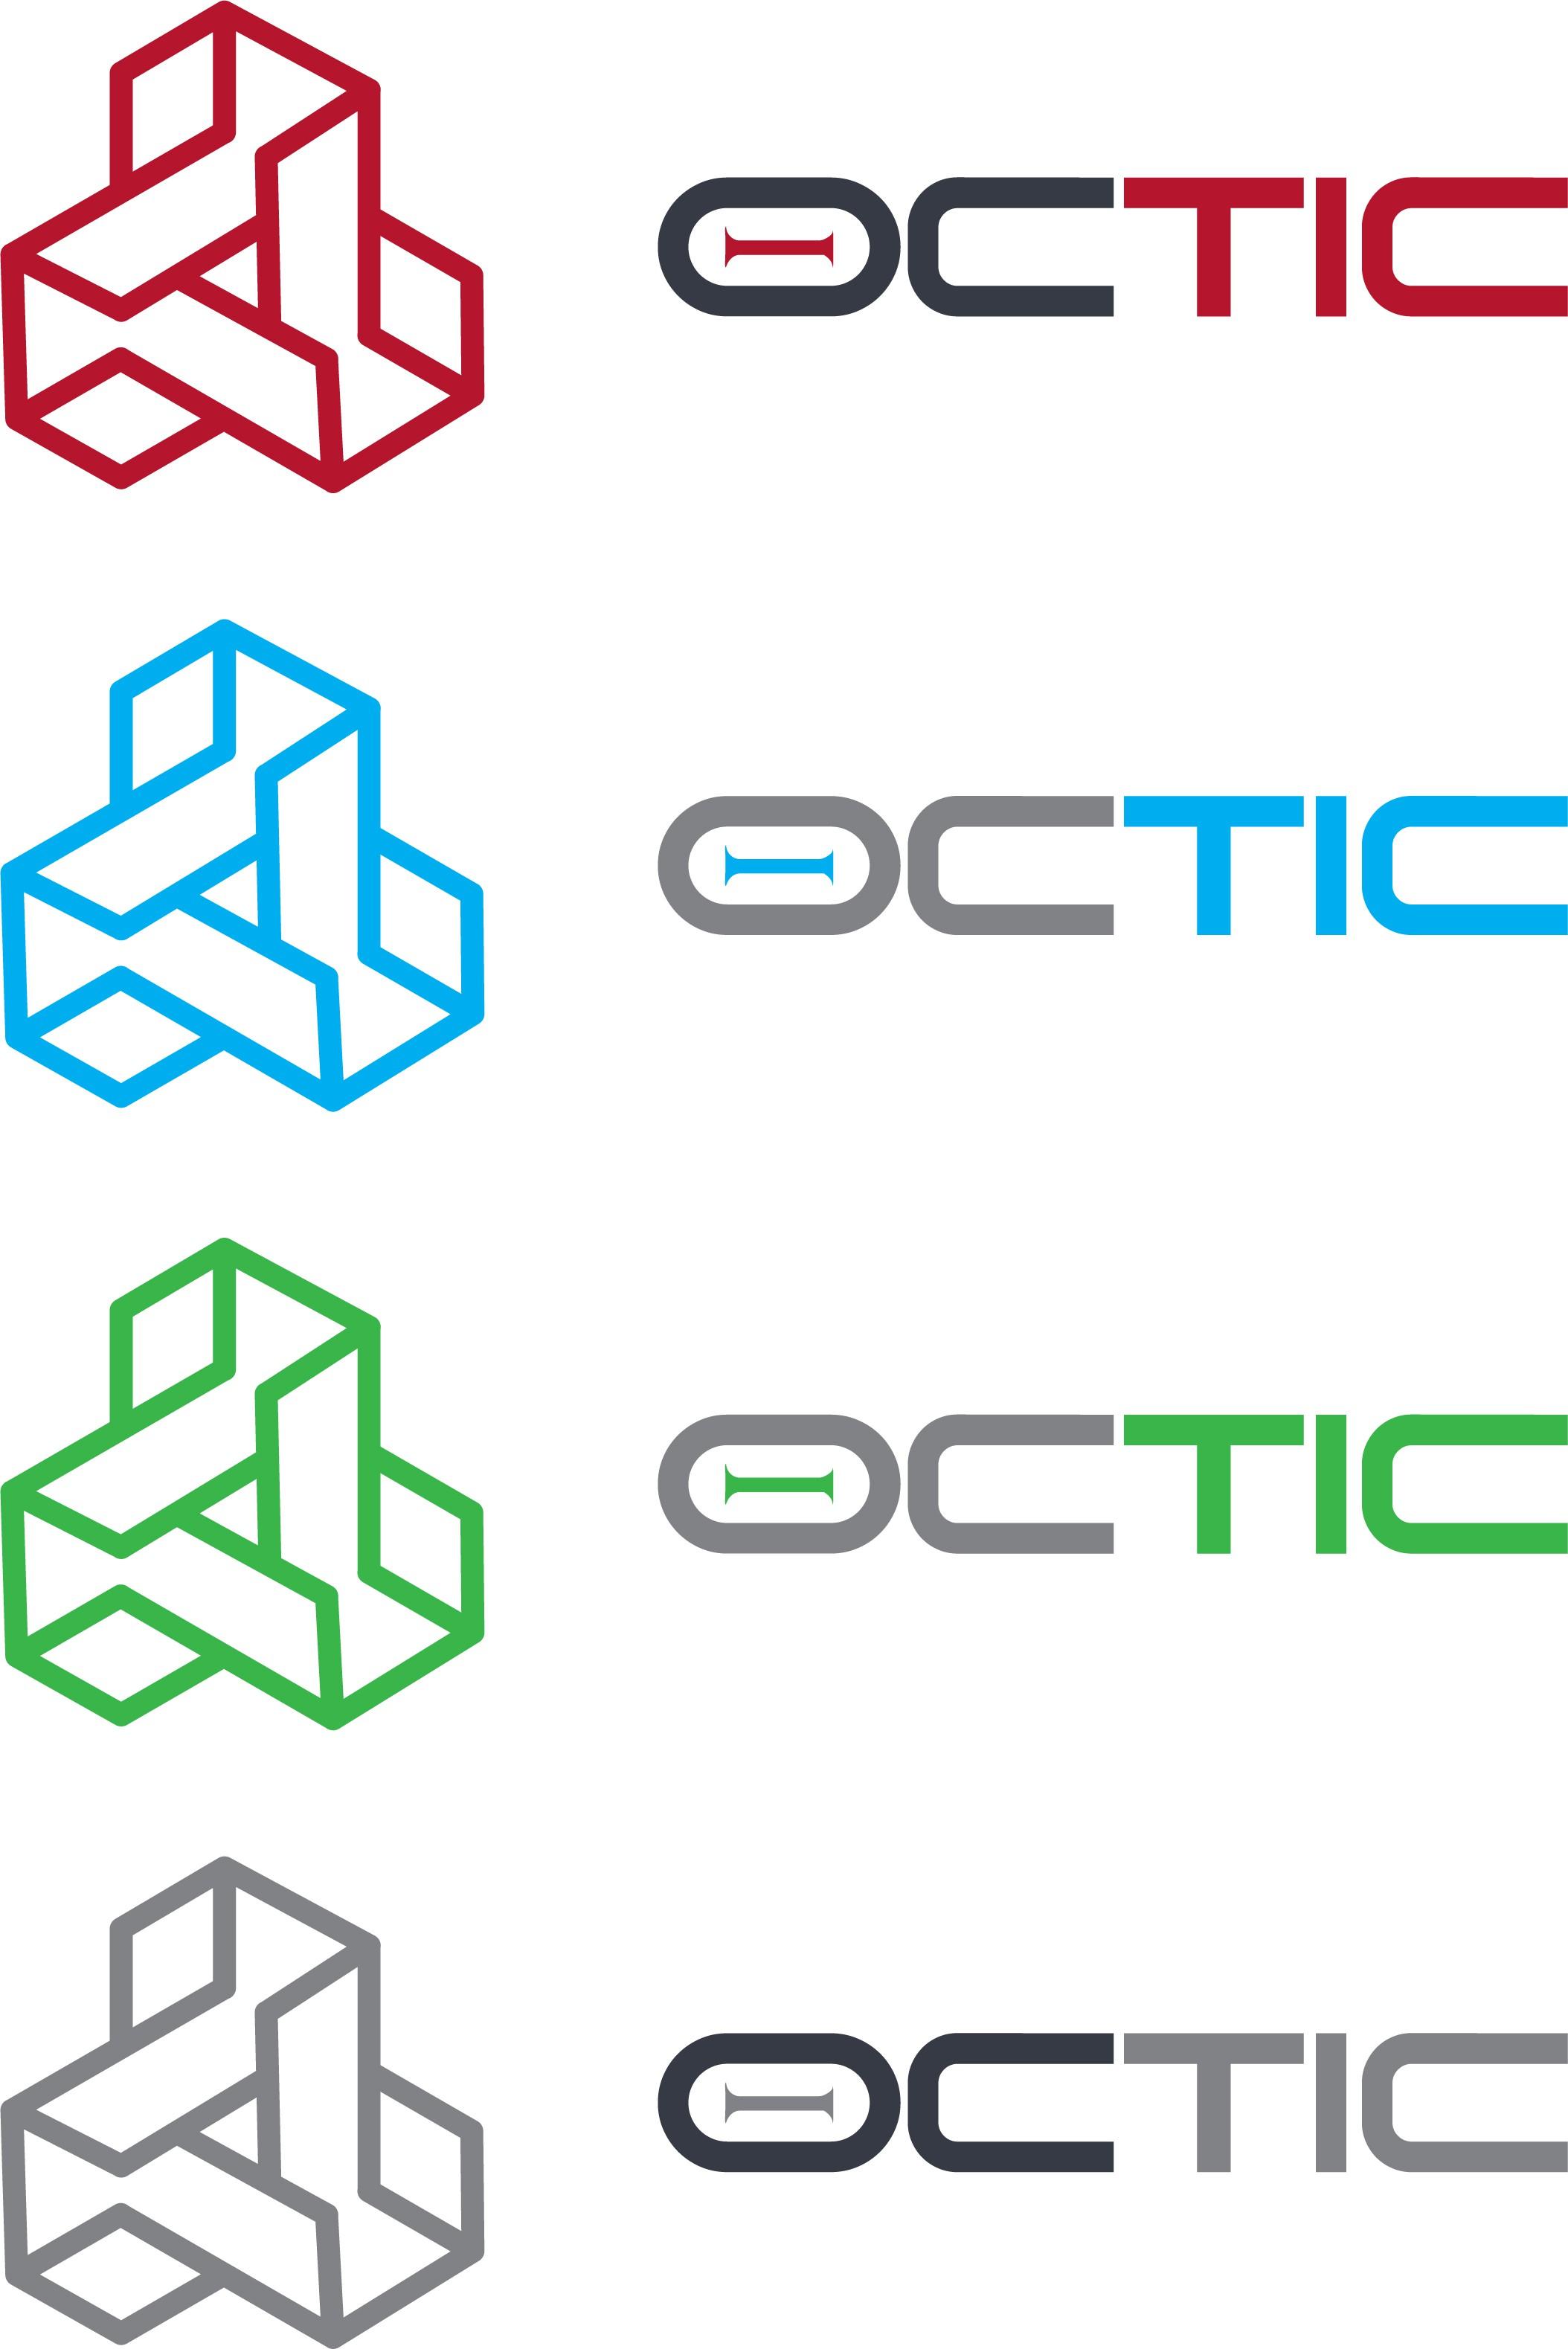 Design a logo for a Top-tier Quantitative Crypto-currency Fund